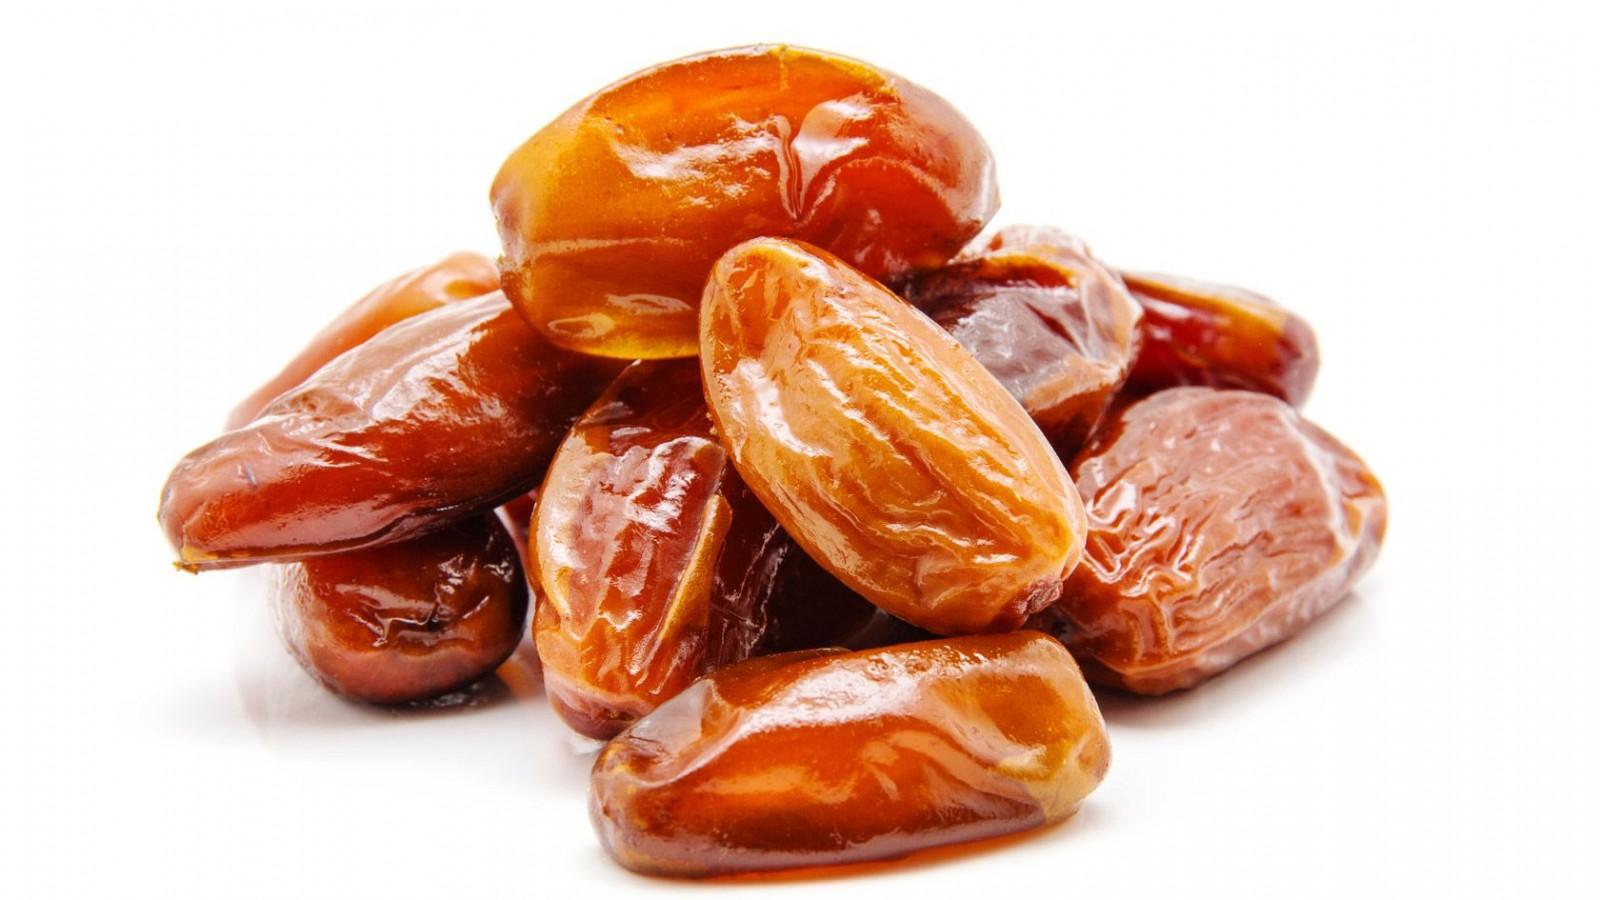 Daktyle Deglet Nour cena bez pestek 1kg